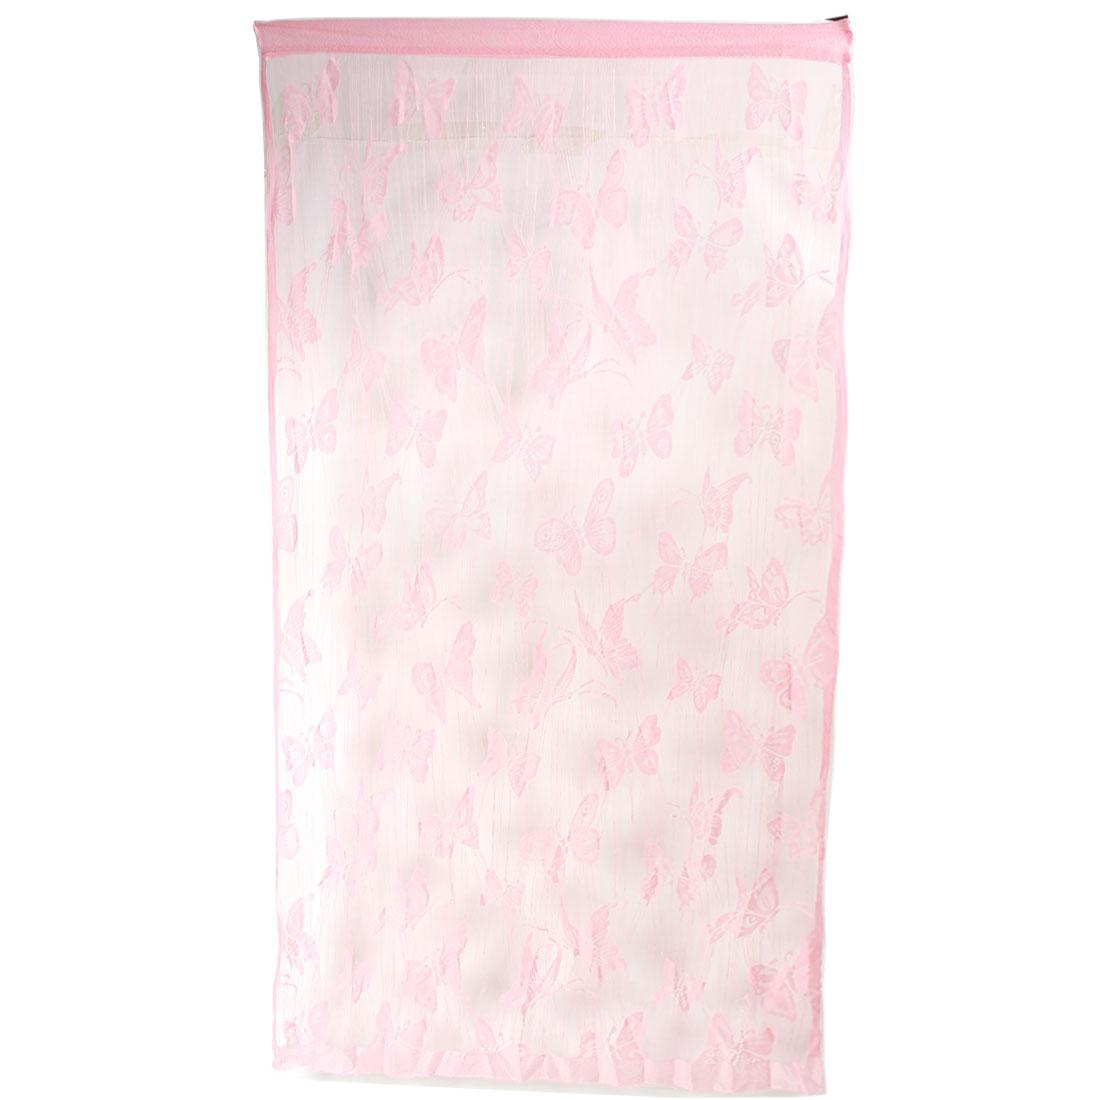 Household Nylon Butterfly Line Pattern Divider Tassel String Door Window Curtain Pink